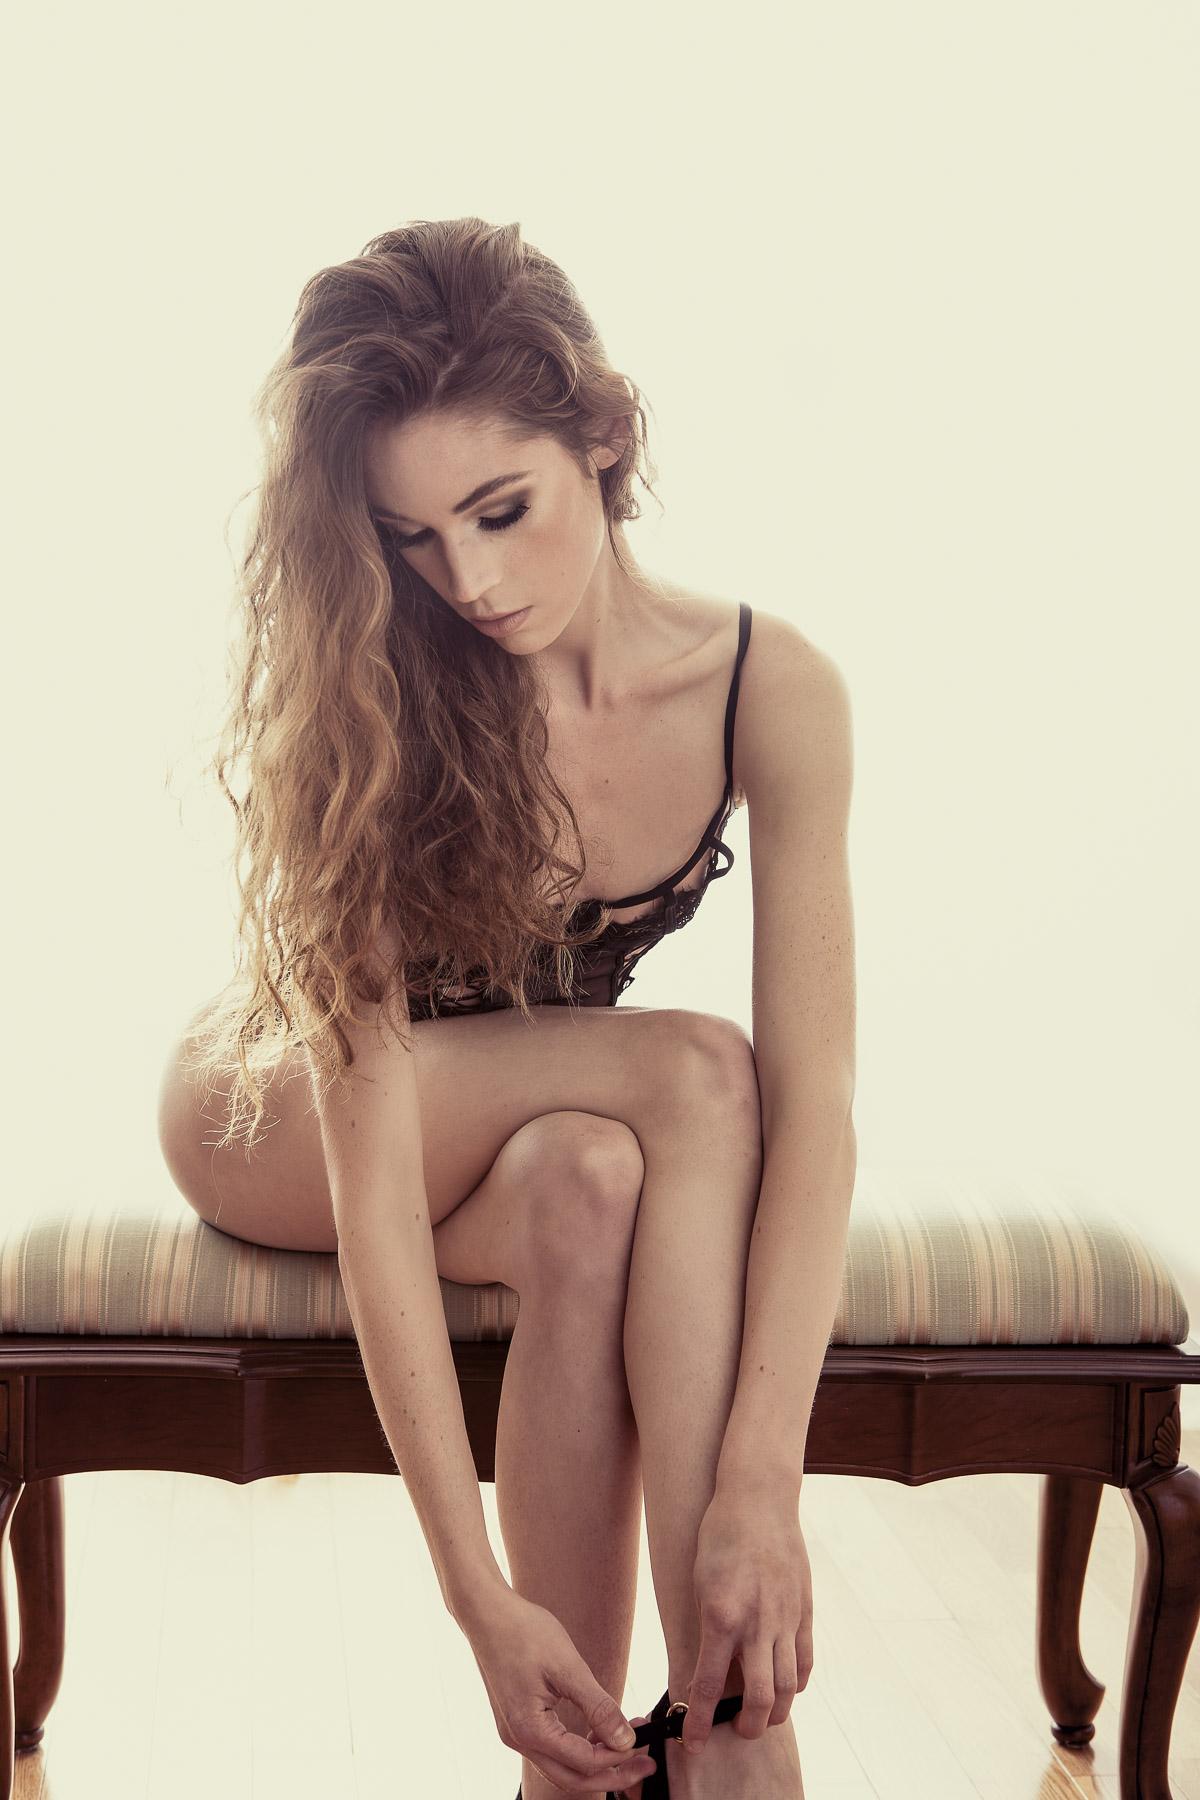 Sexy & Seductive Boudoir Photo - Victoria BC